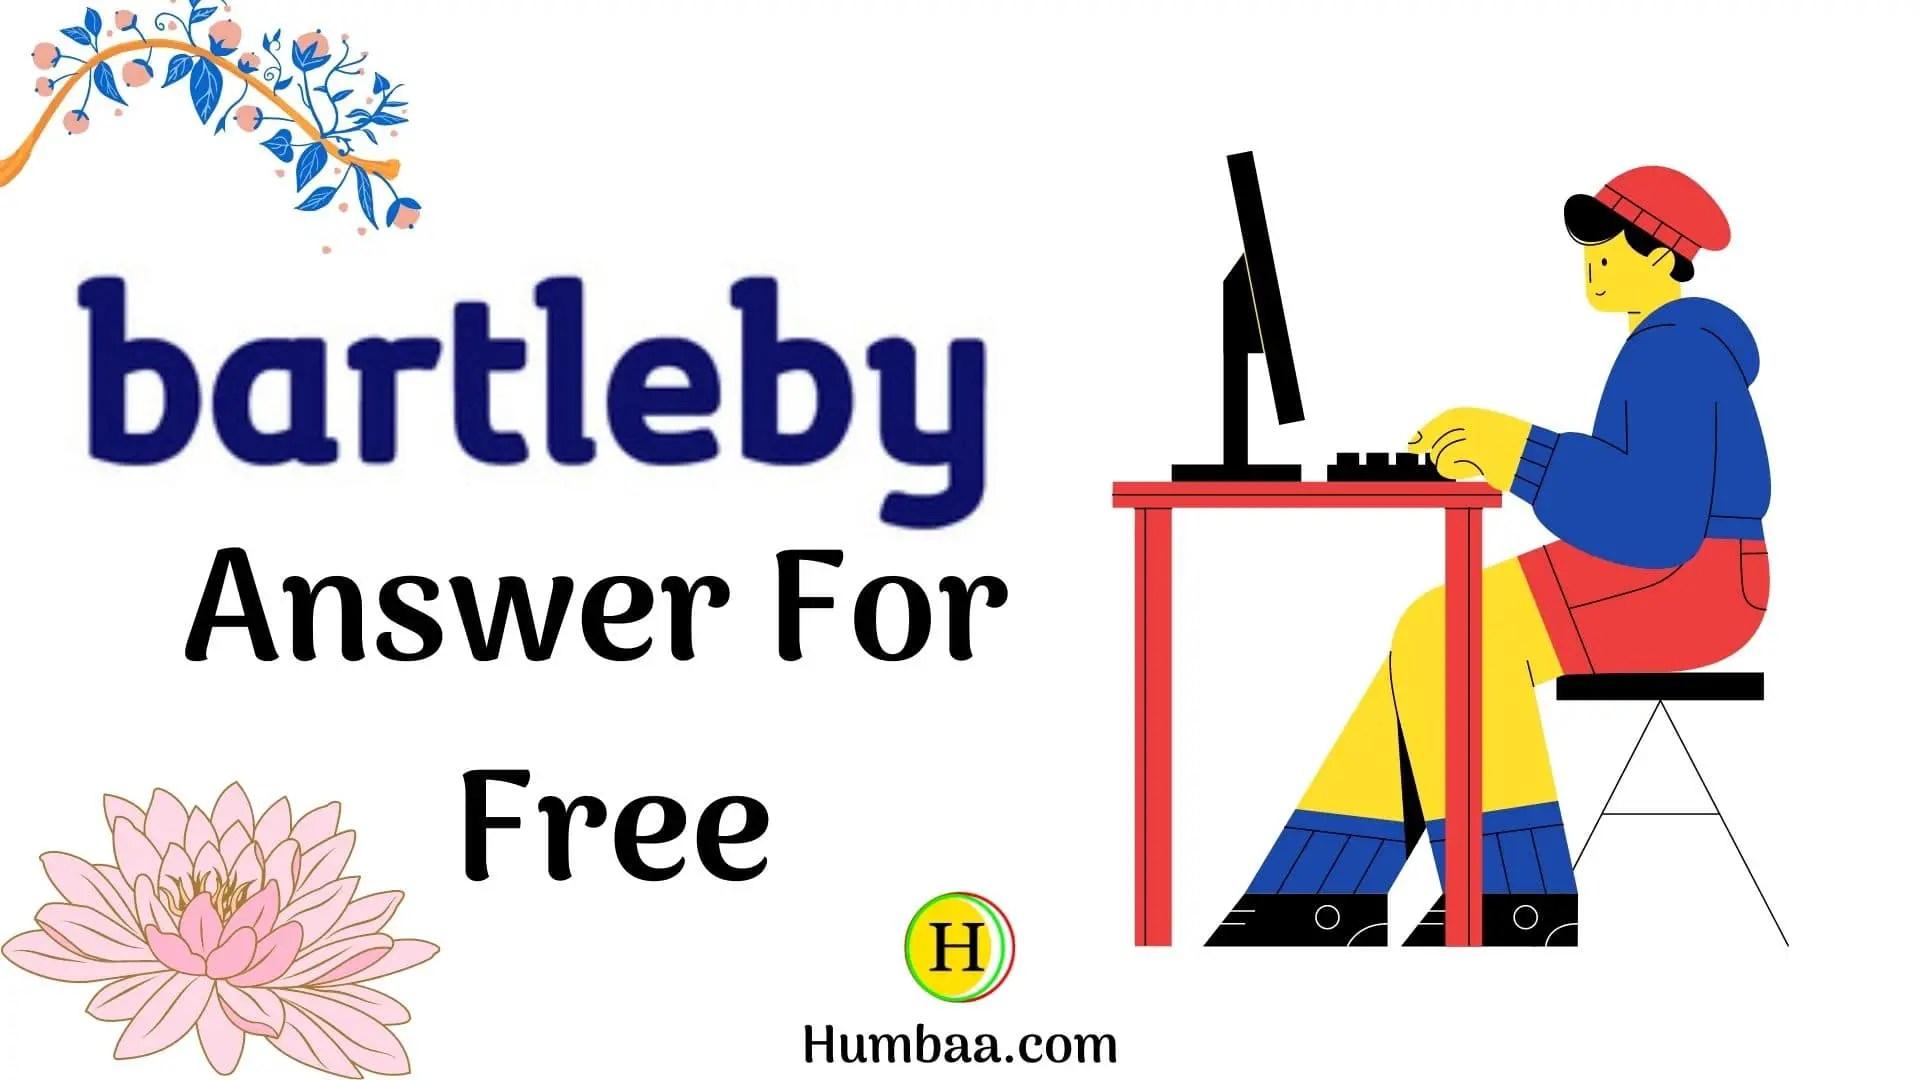 bartleby free answers